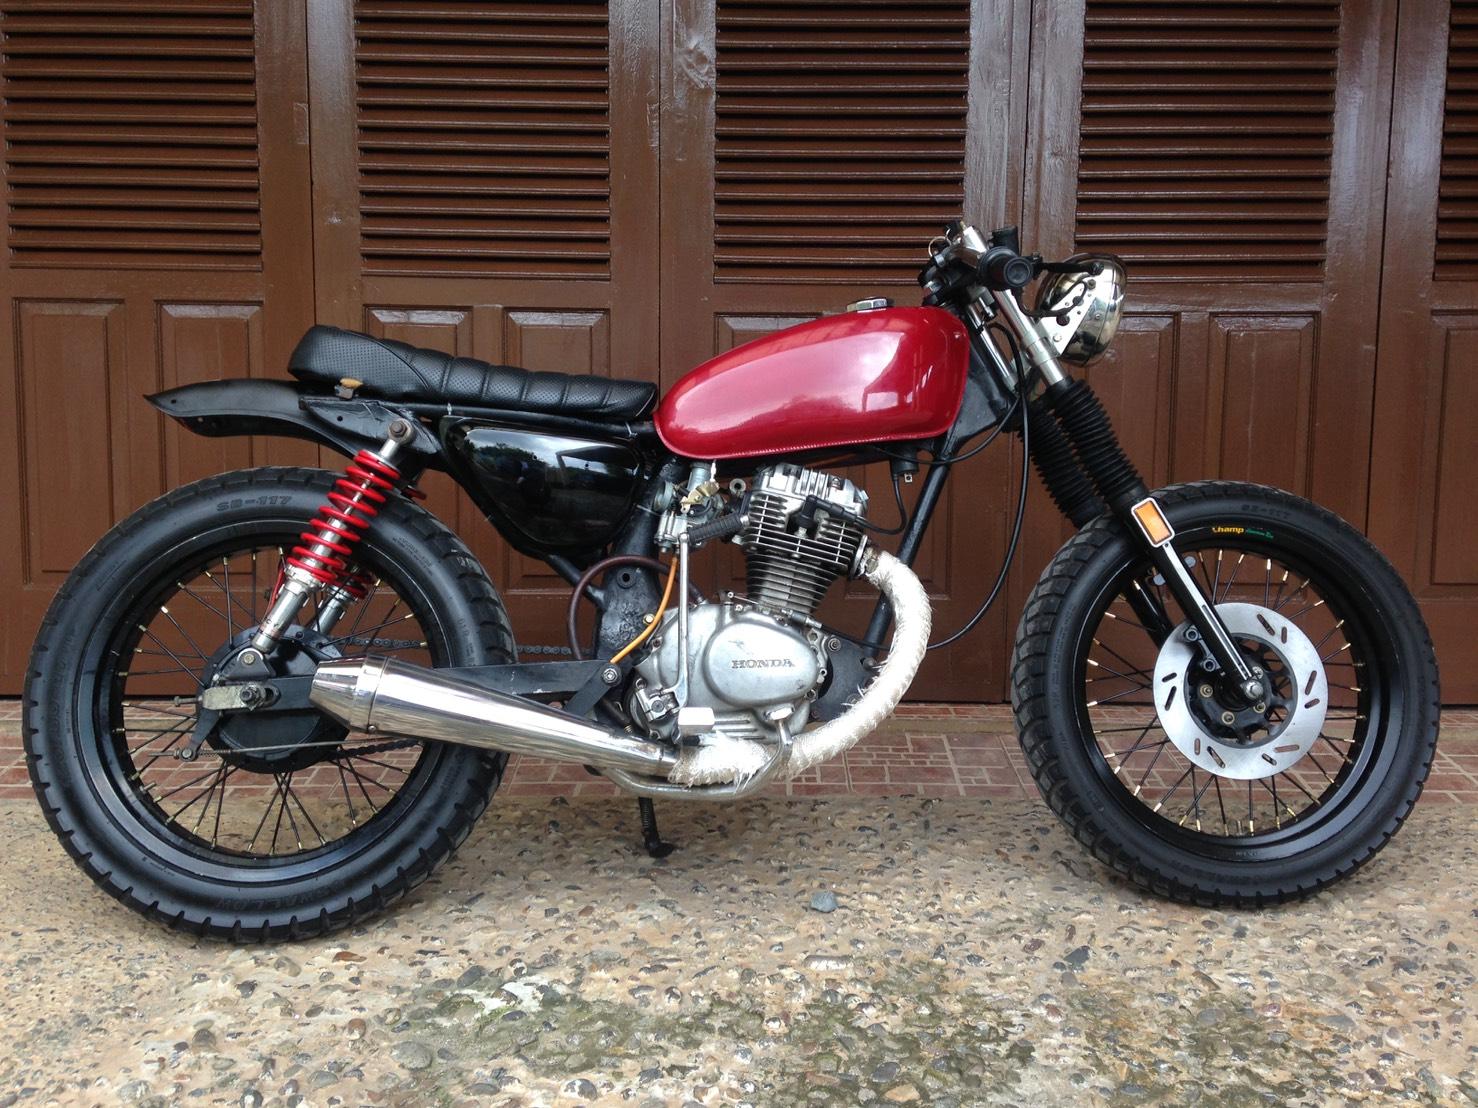 107 Modifikasi Motor Scorpio Menjadi Cb Modifikasi Motor Honda CB